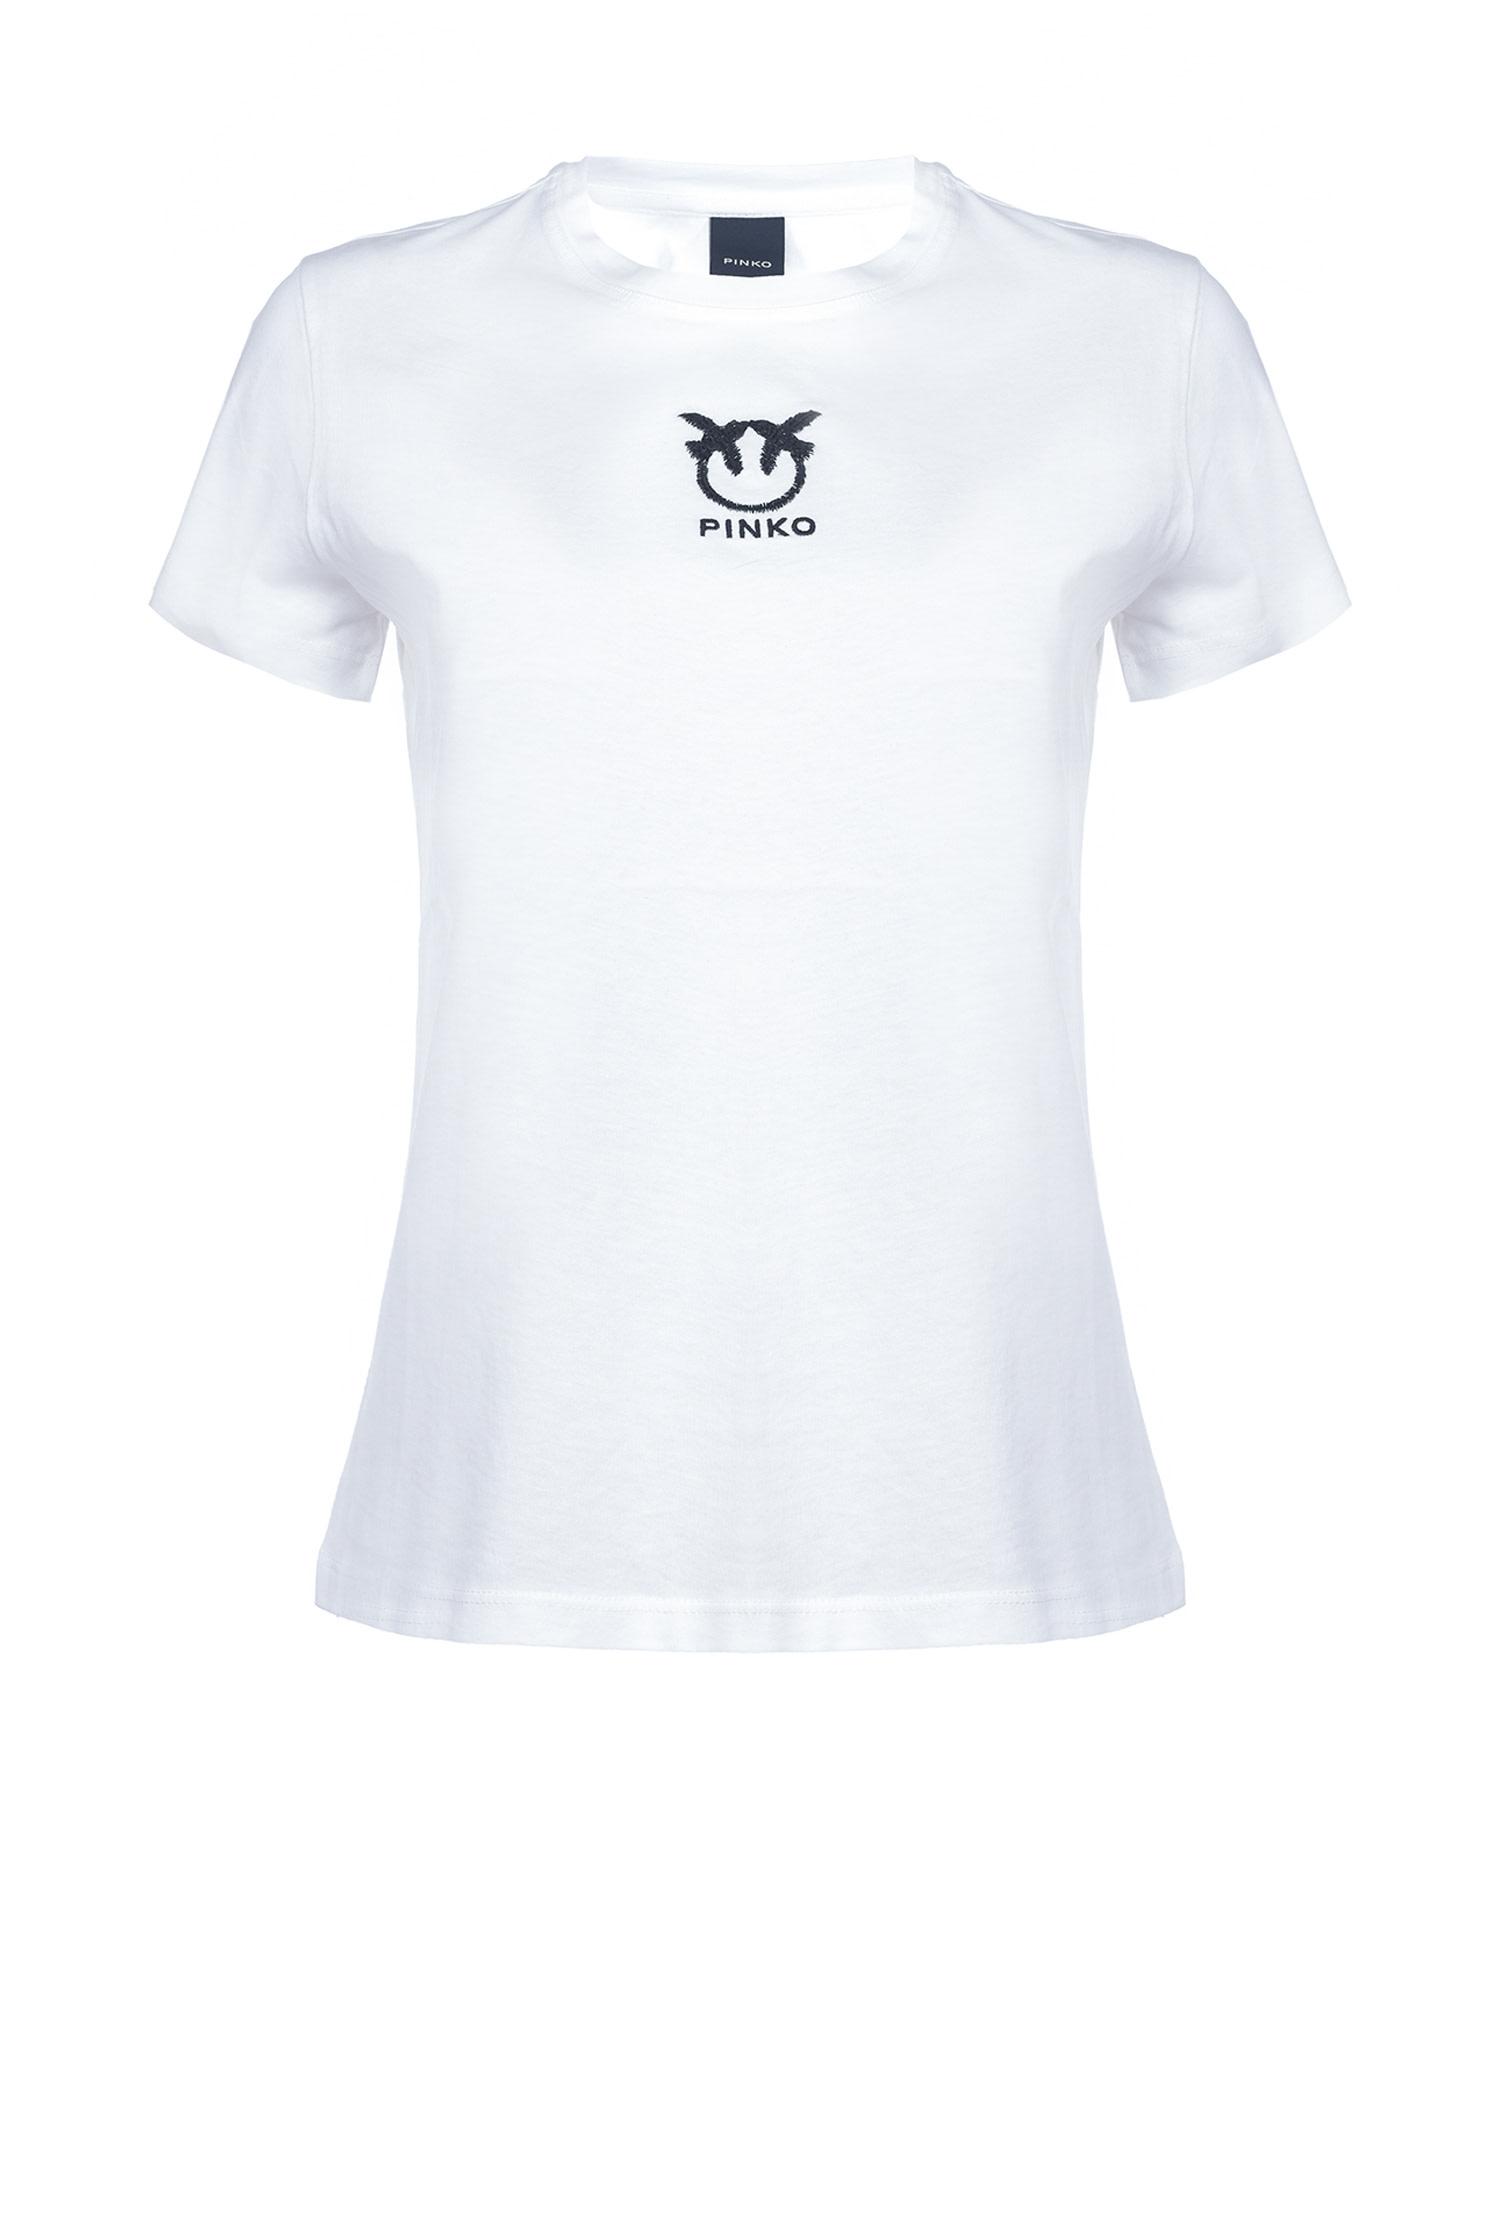 T-shirt Bussolano logo love birds citronella Pinko